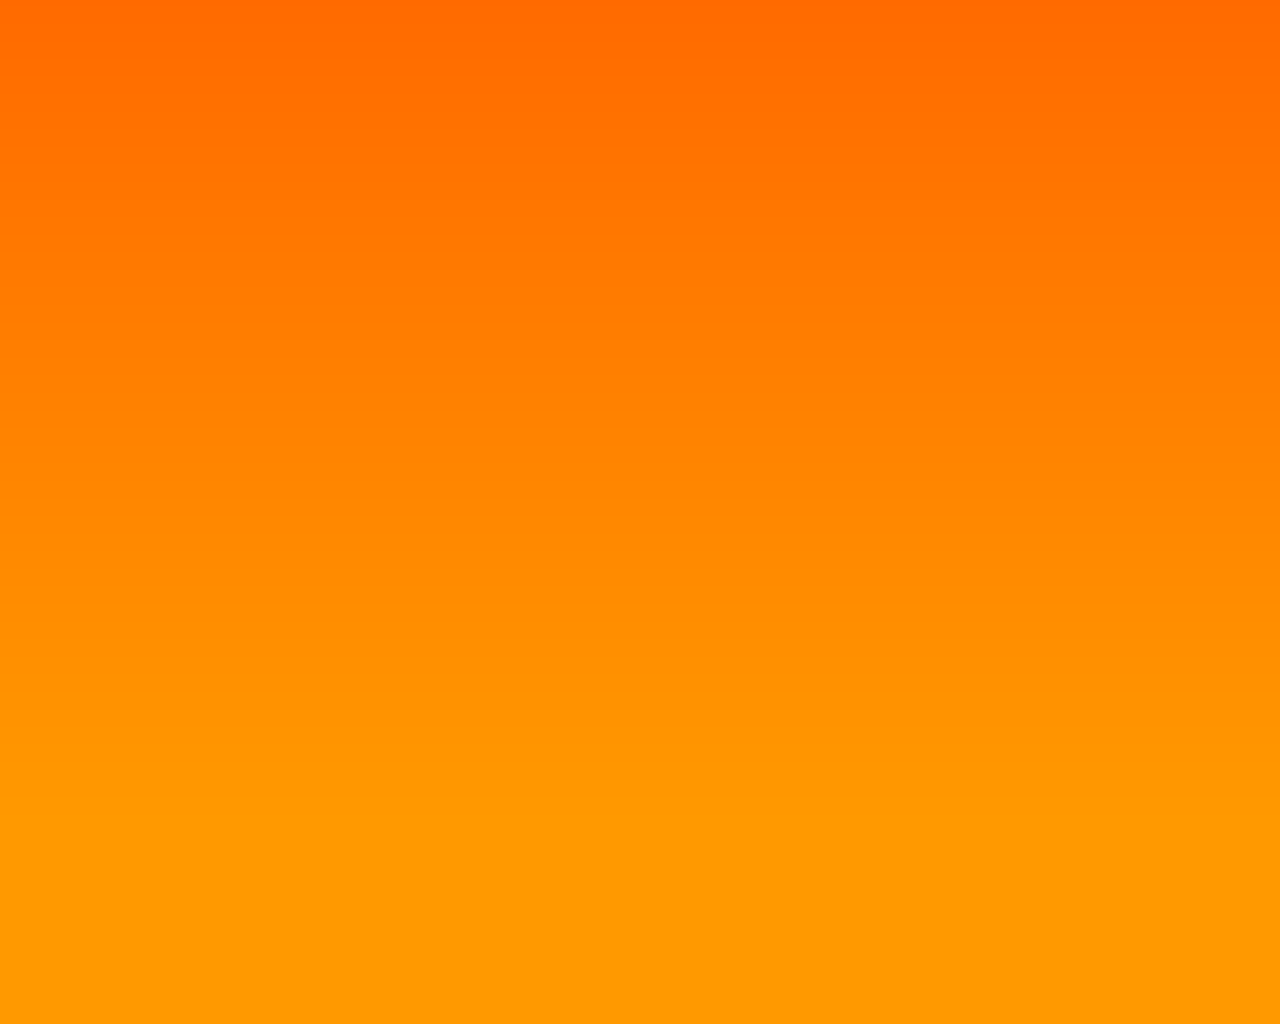 Orange Wallpaper Backg...